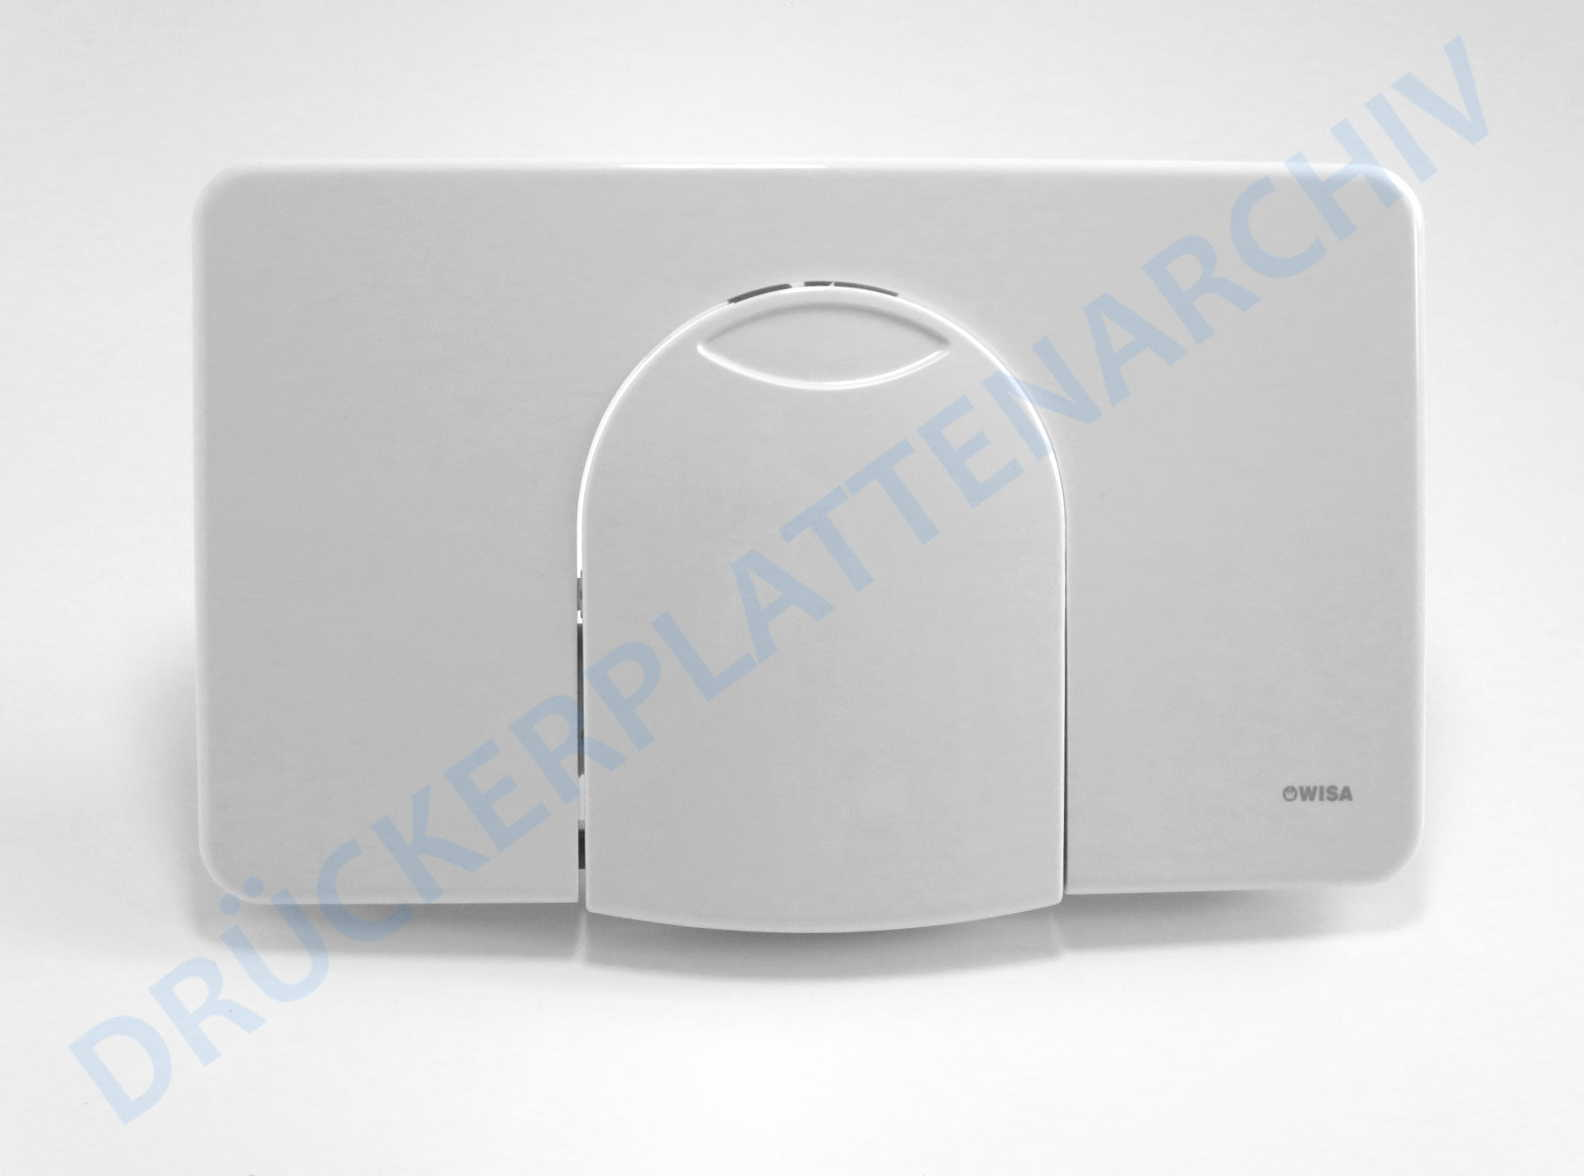 wisa dr ckerplatte bet tigungsplatte 2100 su dr ckerplattenarchiv onlineshop. Black Bedroom Furniture Sets. Home Design Ideas